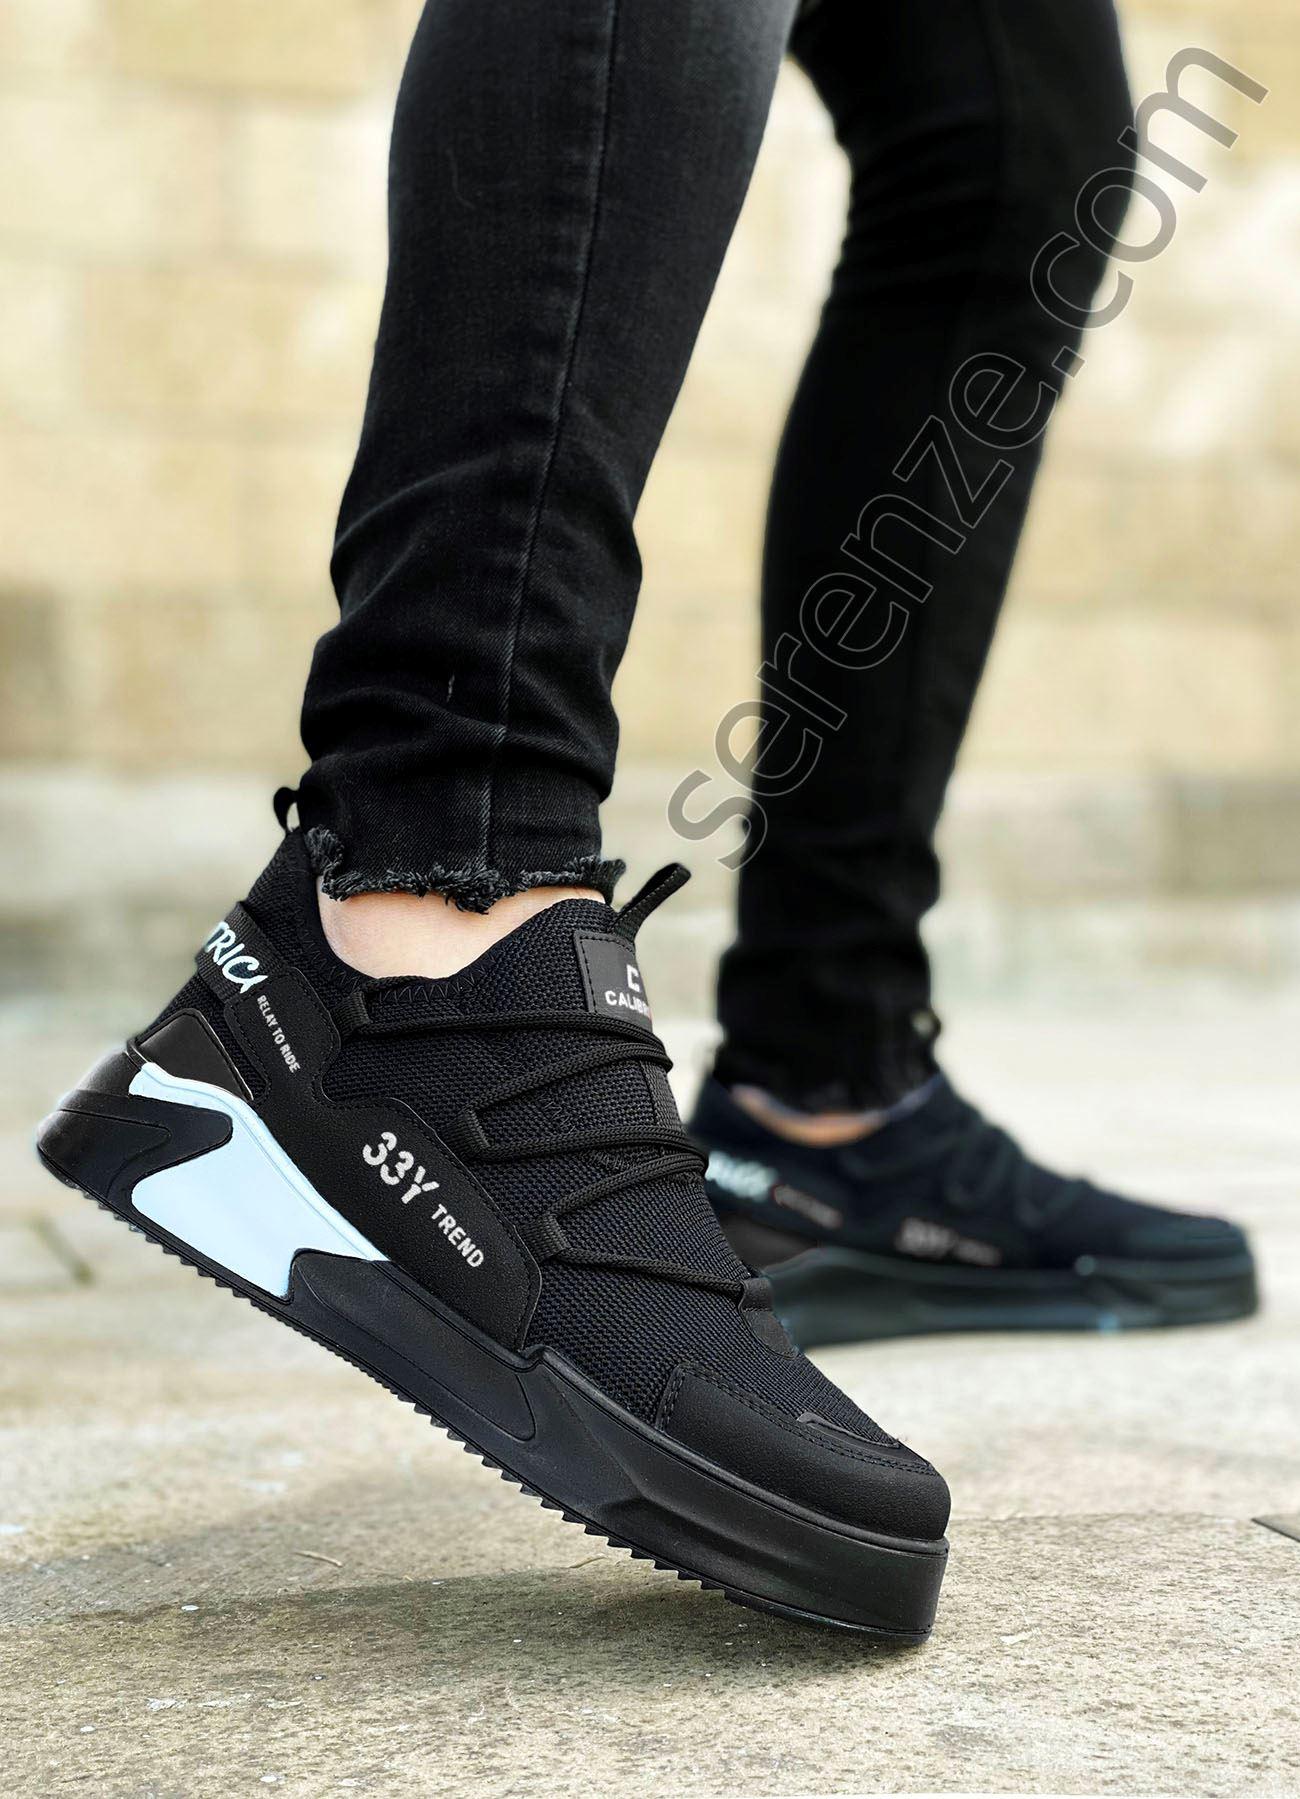 Siyah Siyah Triko Erkek Spor Ayakkabı